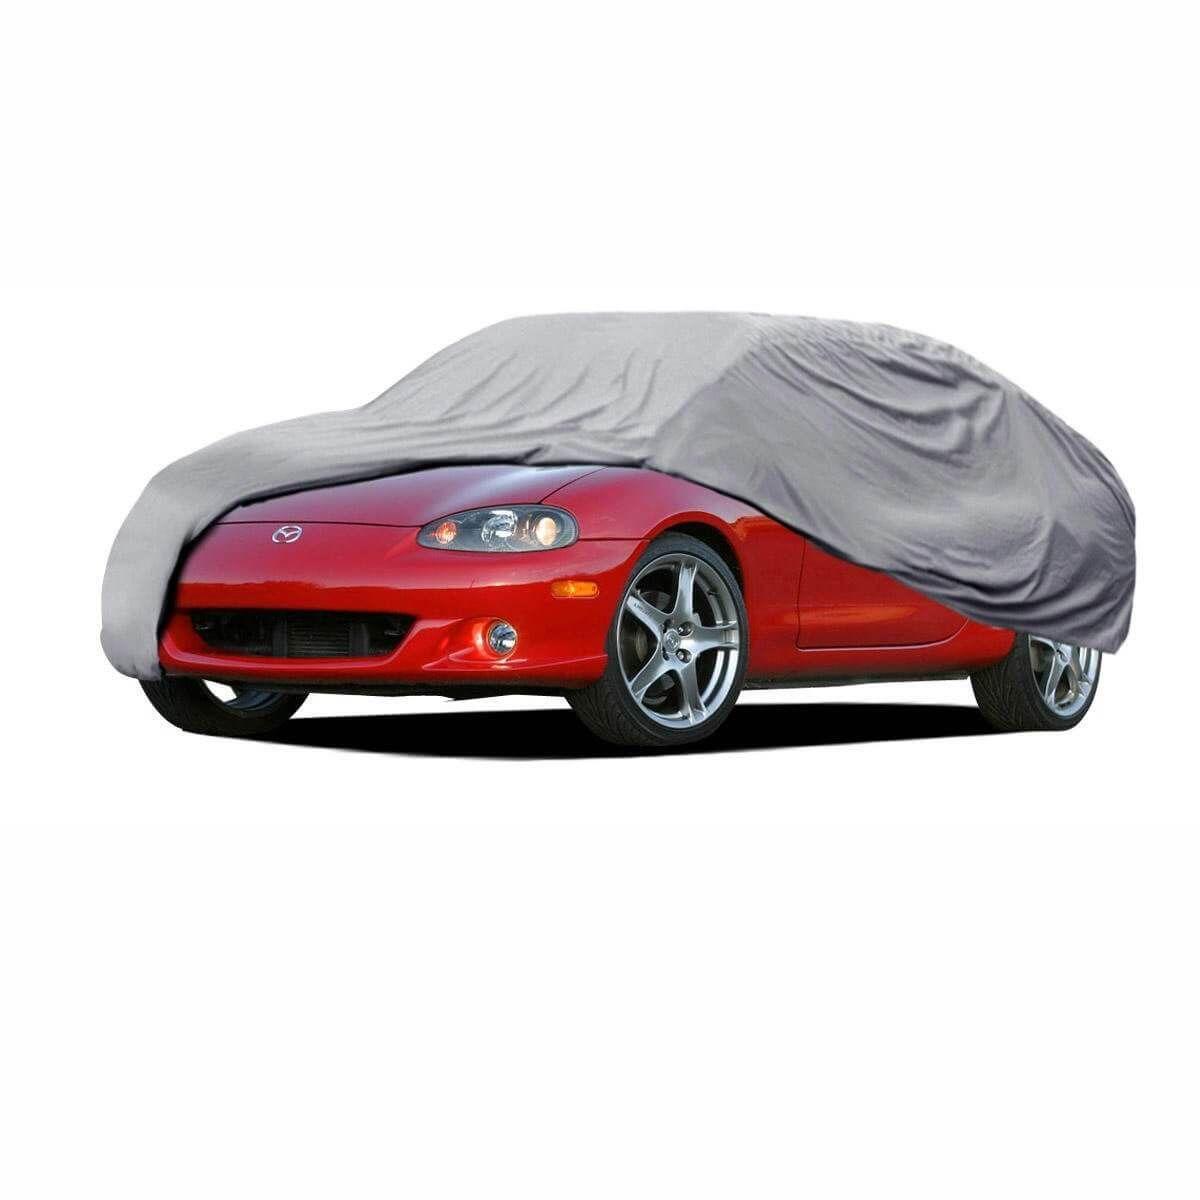 Car Covers Comparison Allweather Vs Waterproof Car Covers Waterproof Car Mazda Miata Car Covers